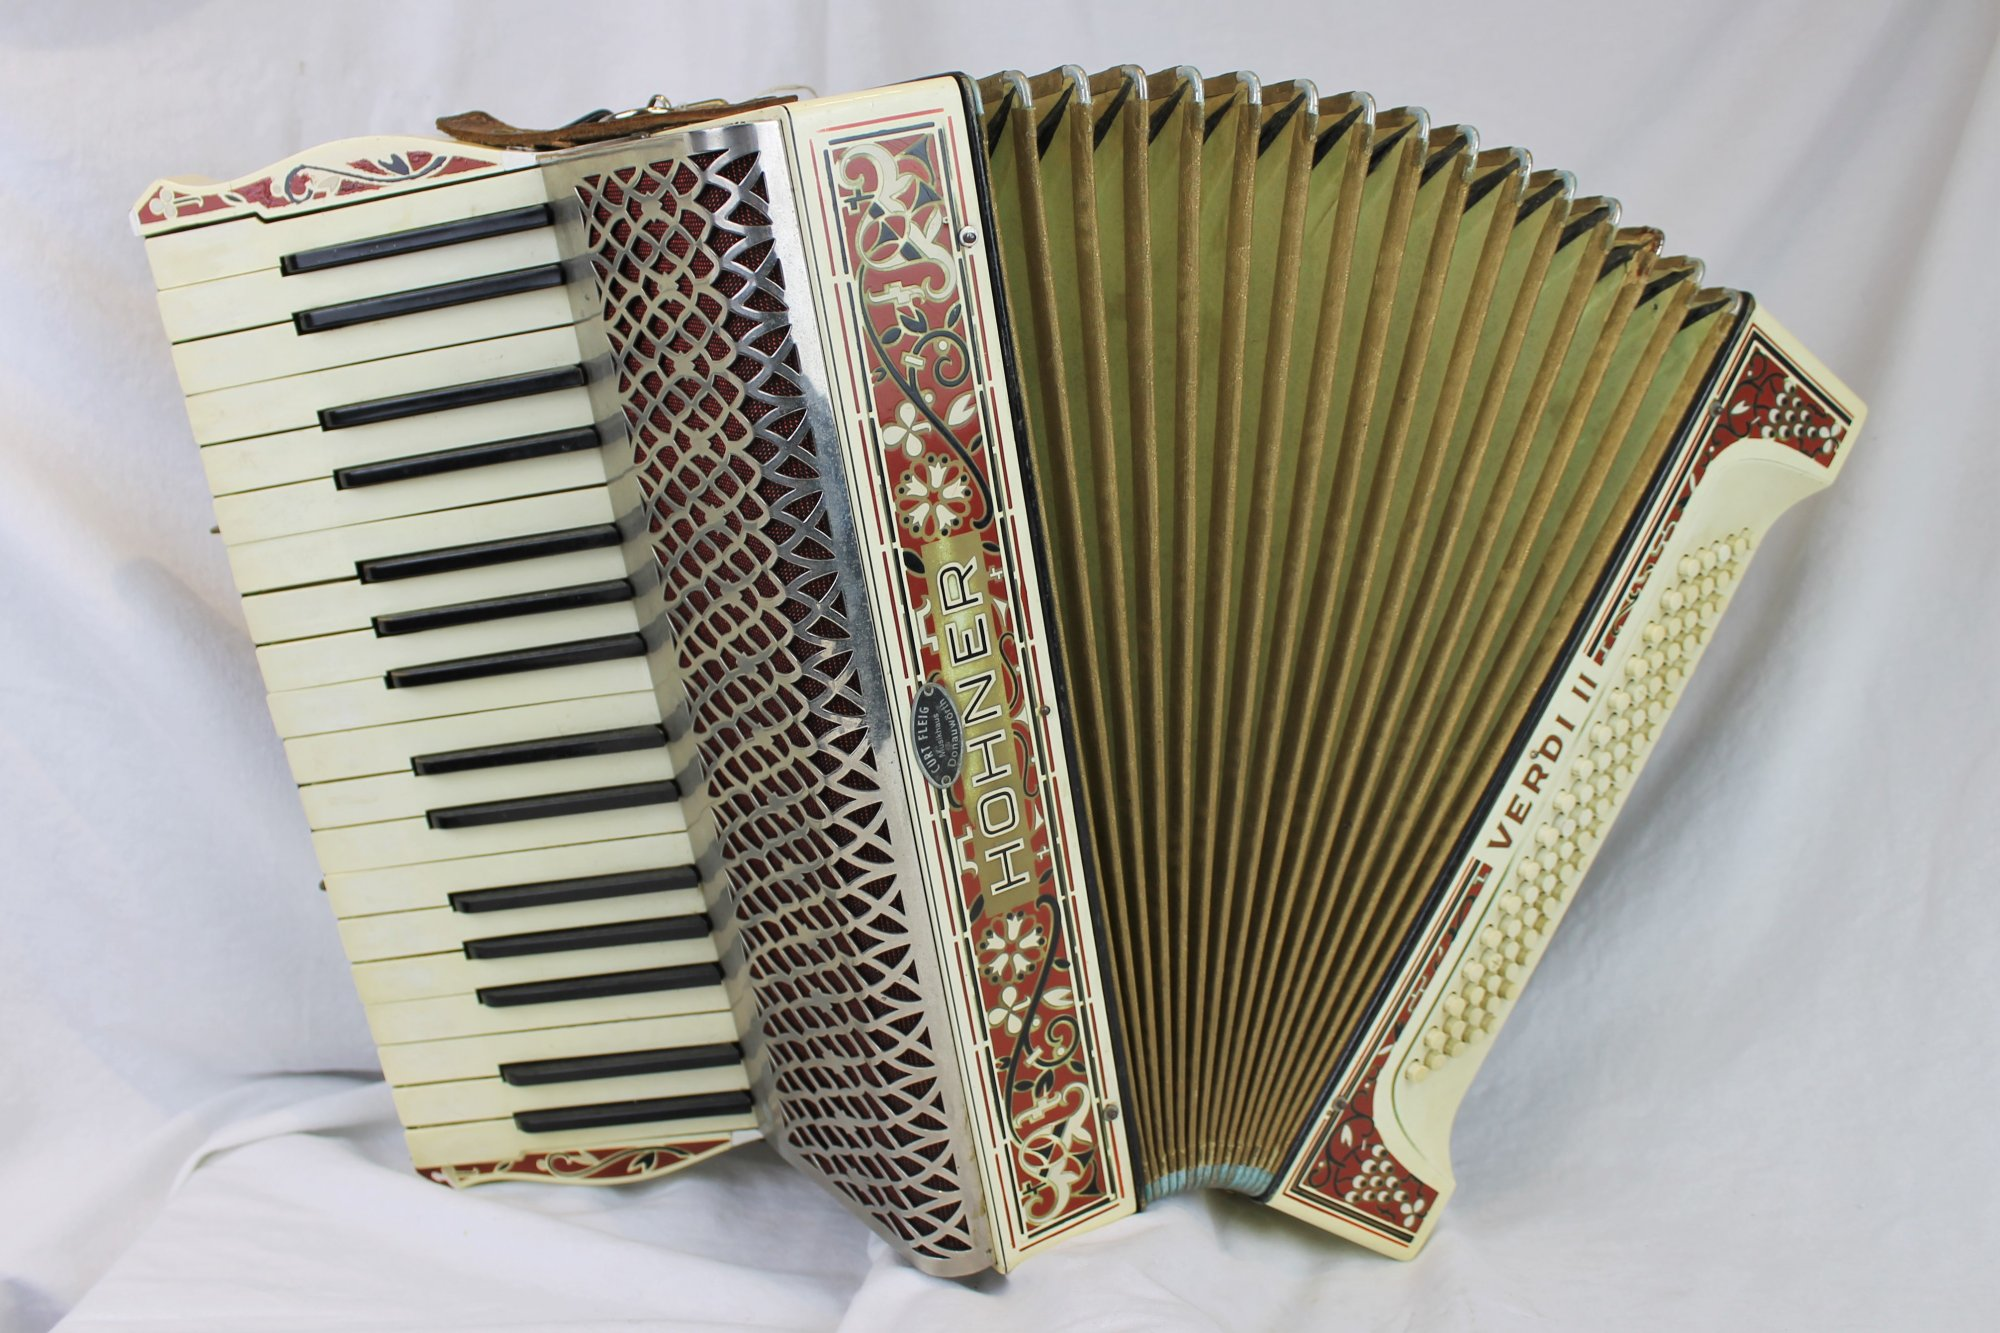 4668 - Scarlet Filigree Hohner Verdi II Piano Accordion MM 34 80